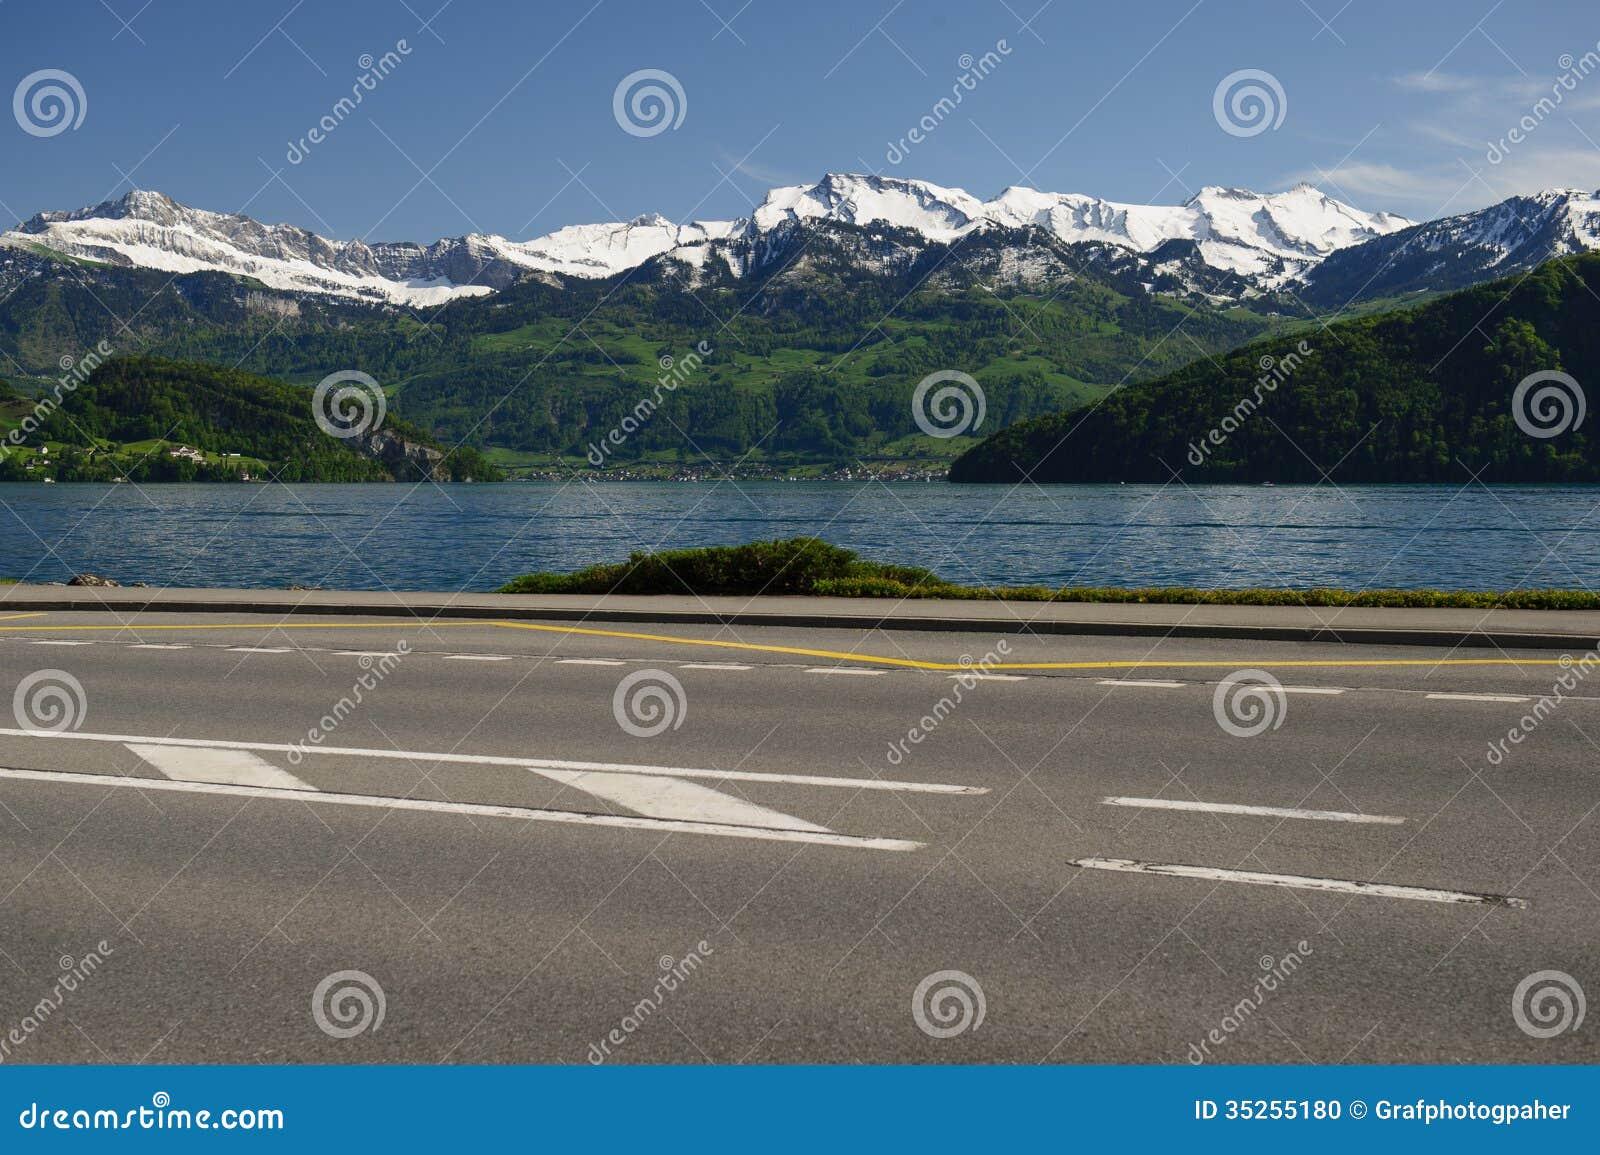 Озеро Люцерн и дорога